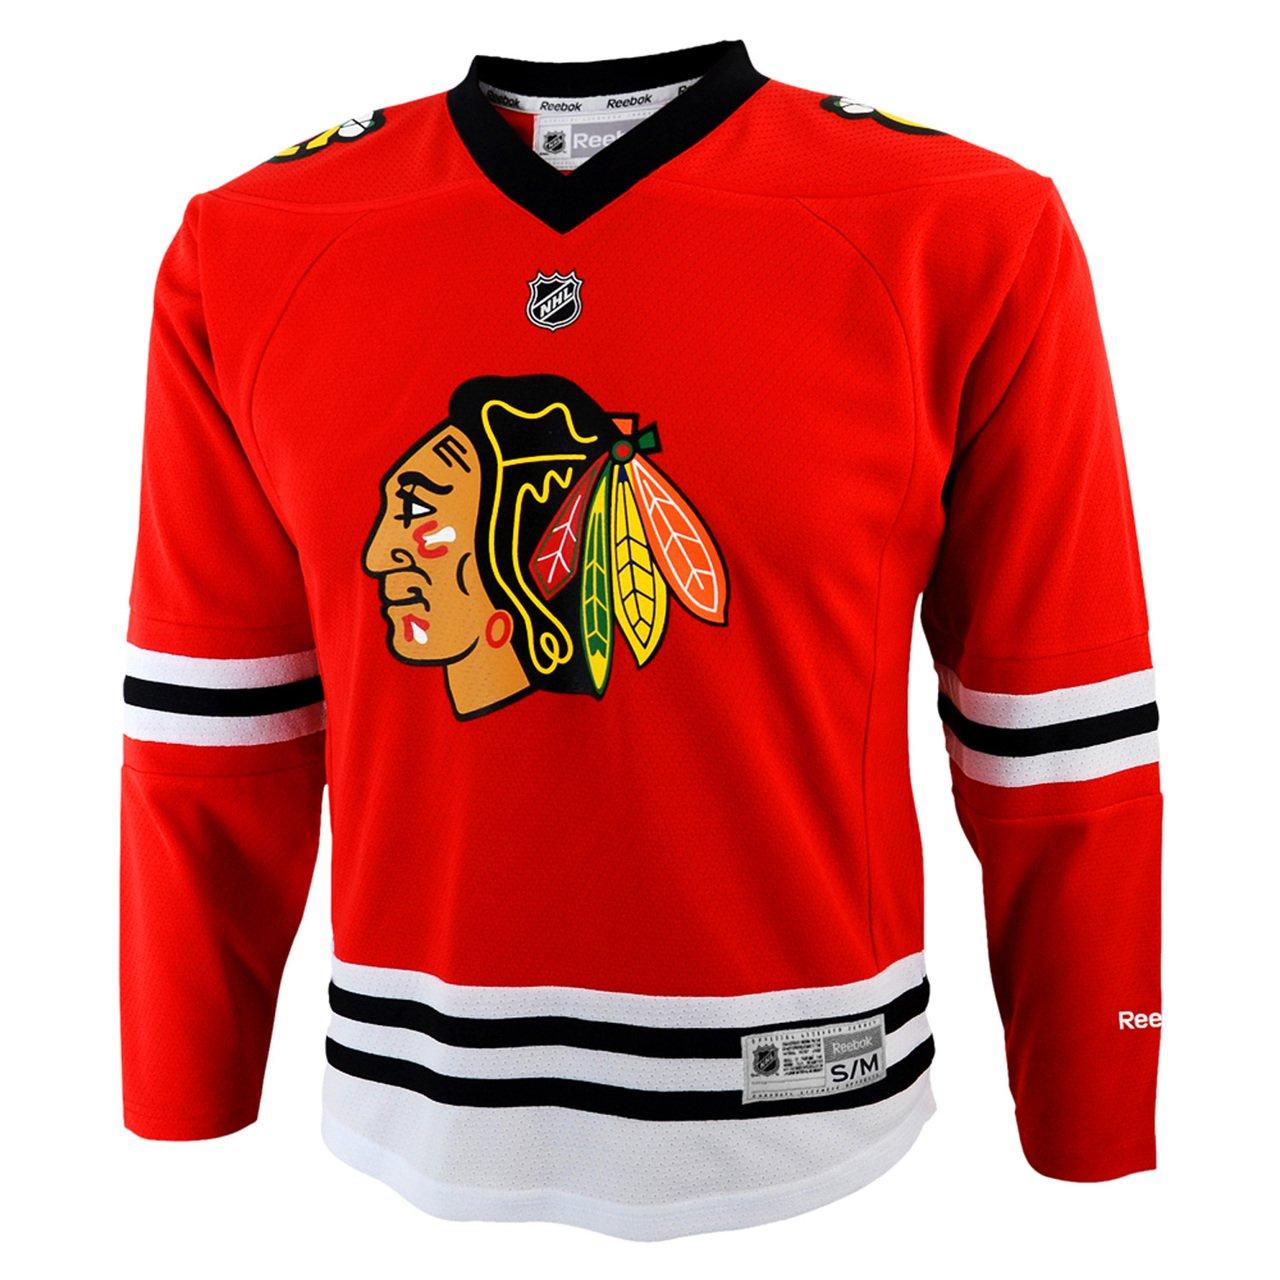 hot sales 0f988 fa82e Patrick Sharp Youth Jersey: Reebok Red #10 Chicago Blackhawks Youth Replica  Jersey